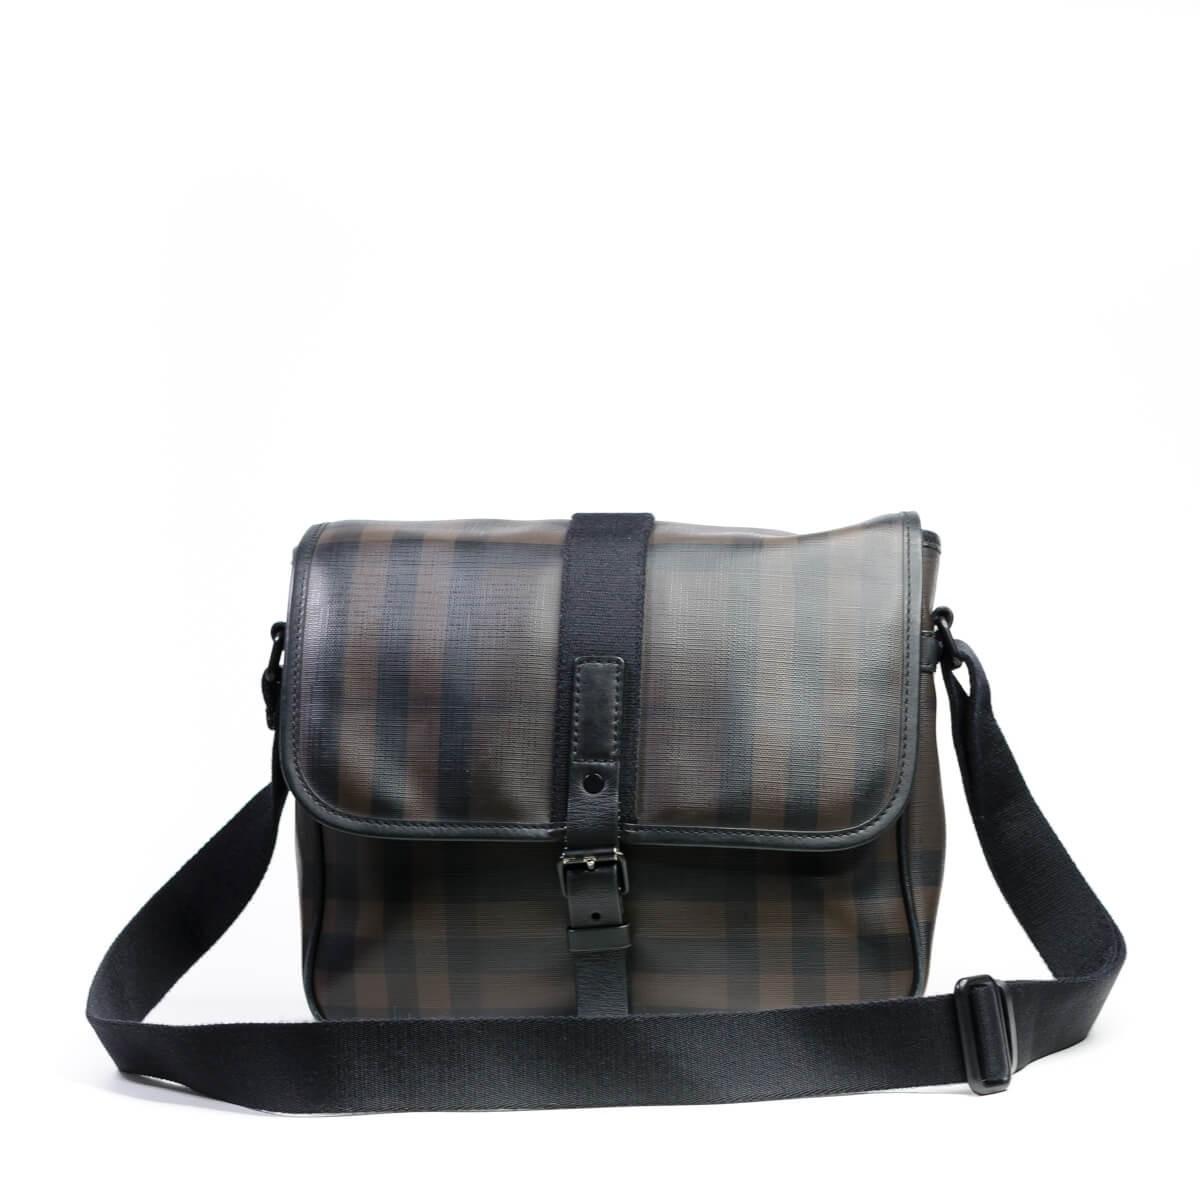 79487a855066 Burberry Smoked Check Crossbody Bag